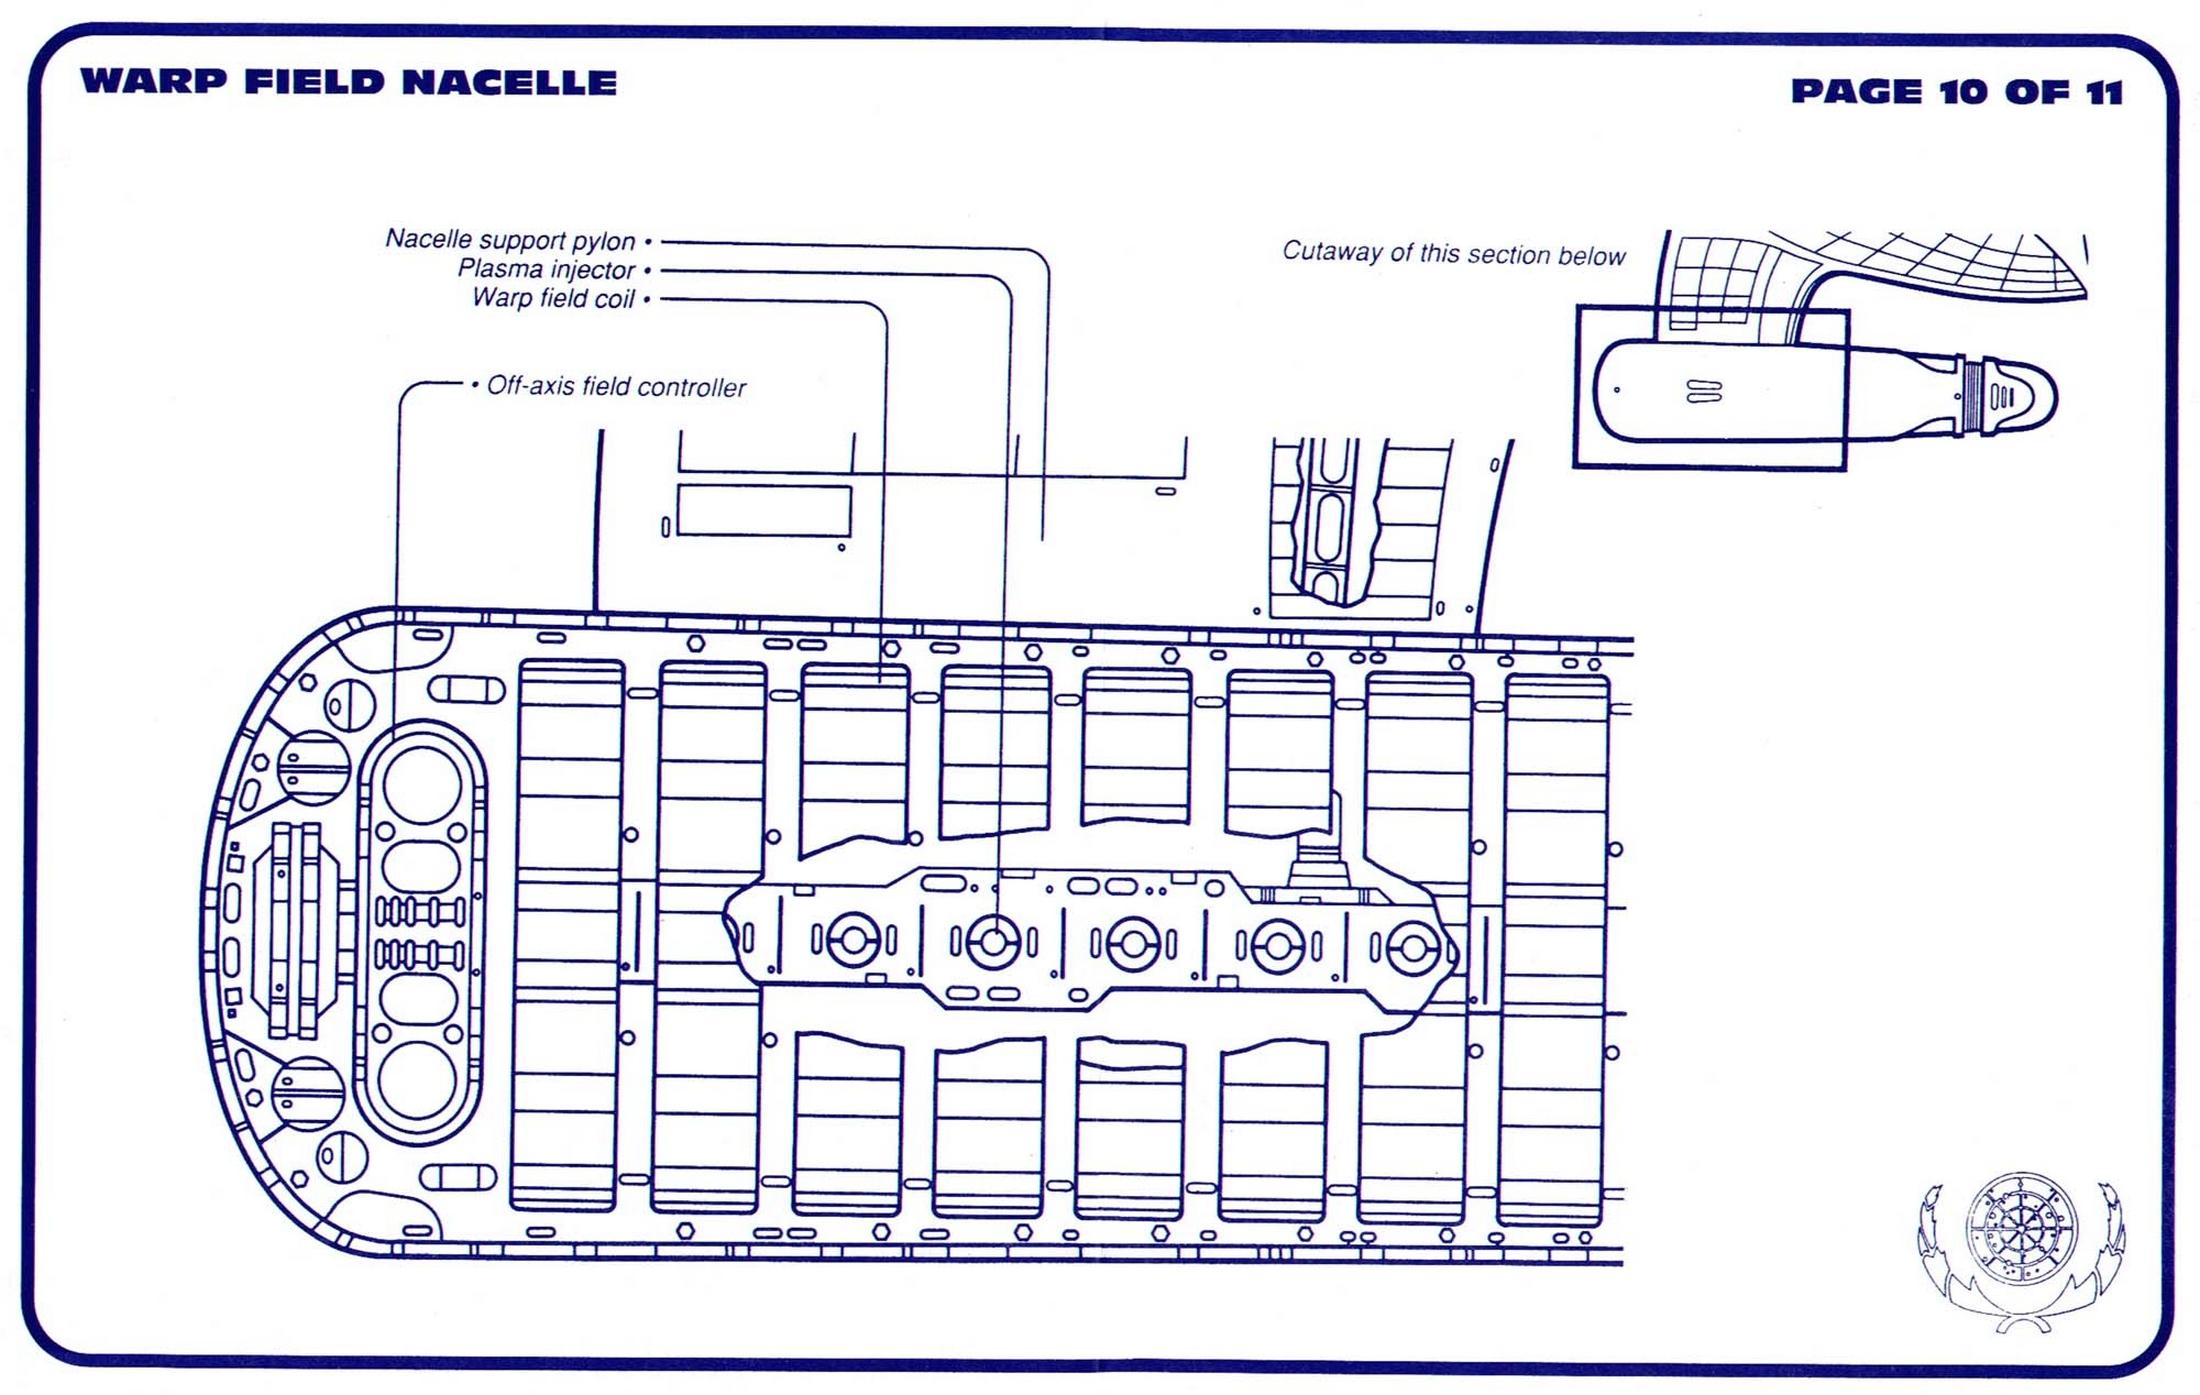 uss enterprise diagram house wiring software star trek ncc 1701 d blueprints schematics warp nacelle